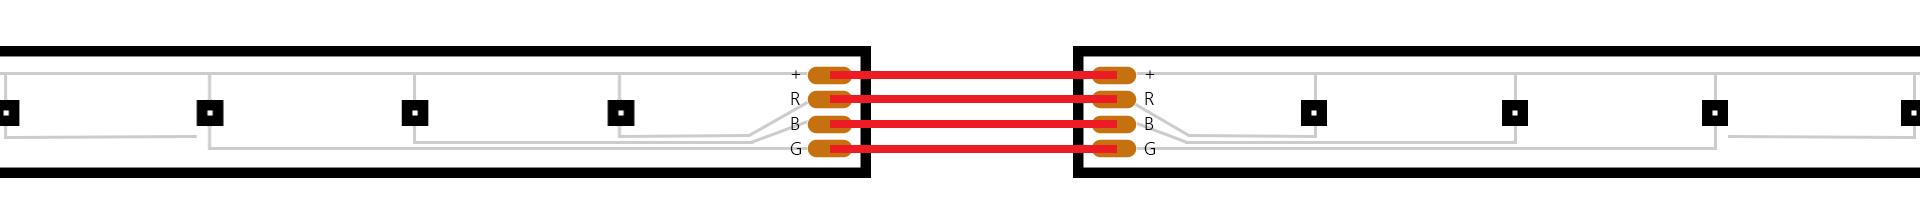 Placing LED Lights